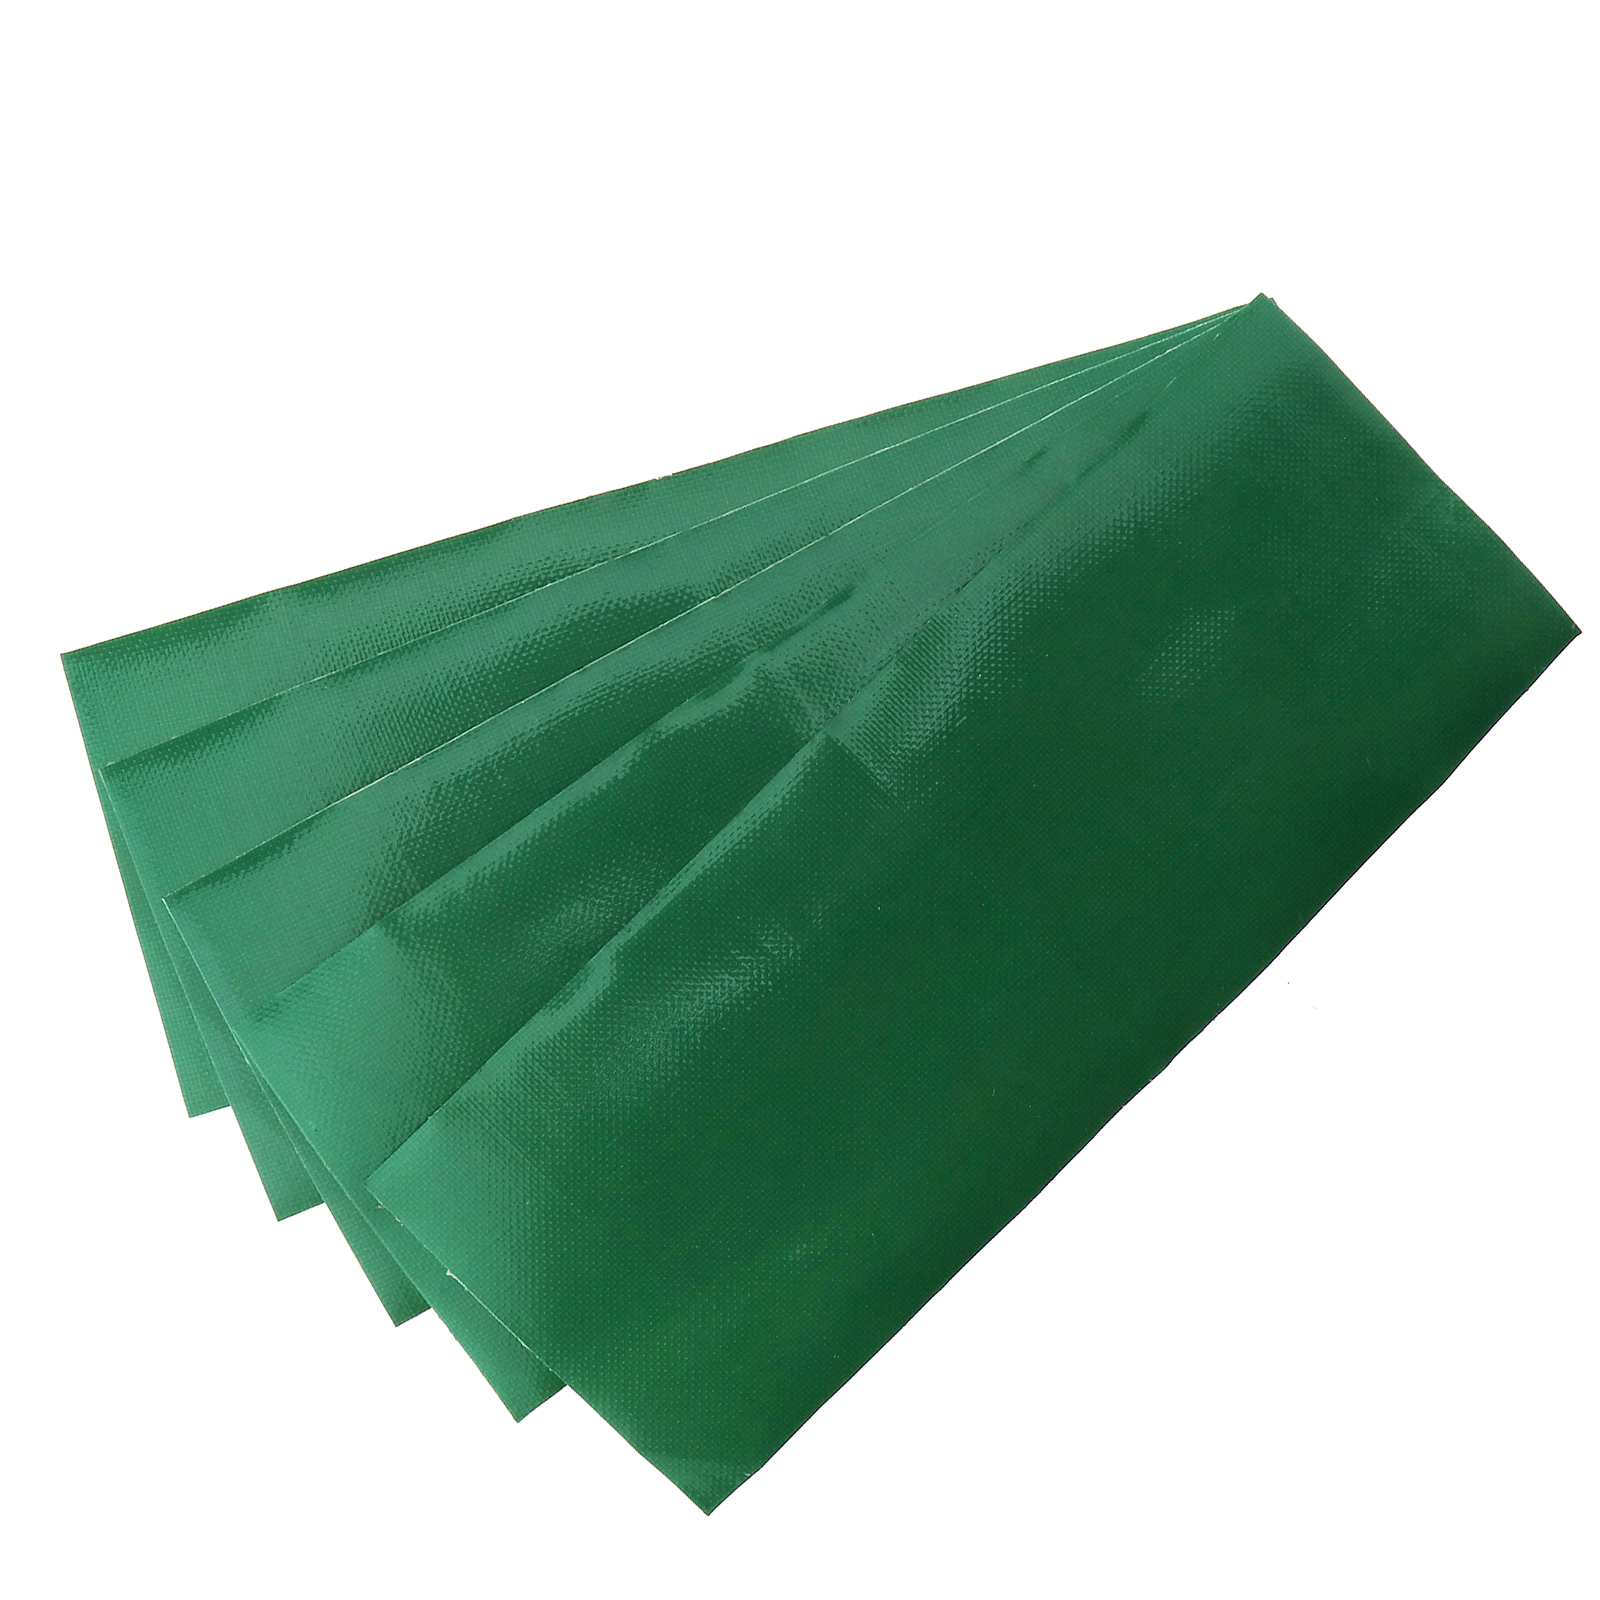 Waterproof Self Adhesive Repair Tape Patch For Tents ...